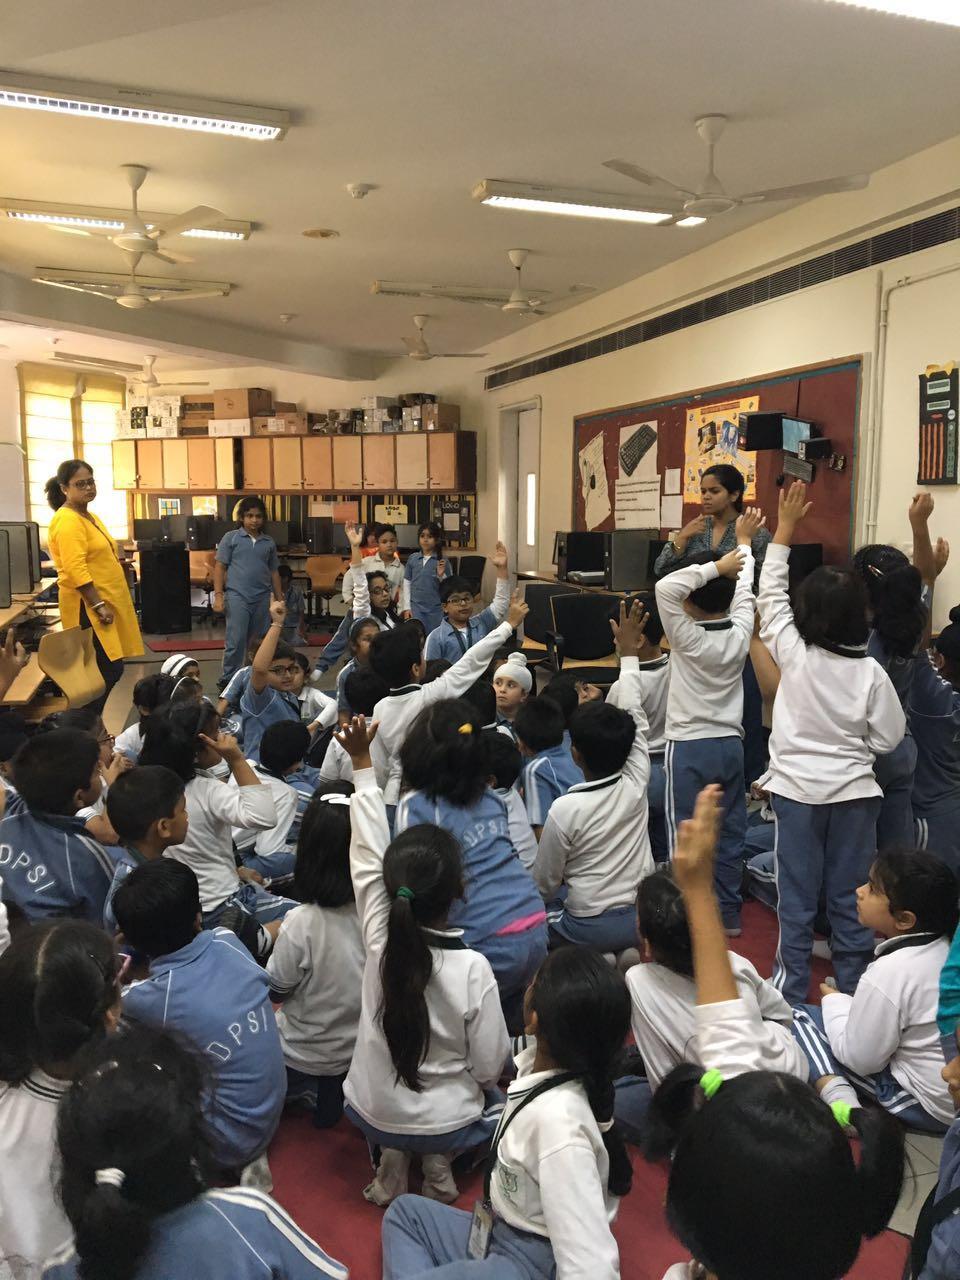 DELHI PUBLIC SCHOOL INTERNATIONAL - RK PURAM - DELHI Photos, Images